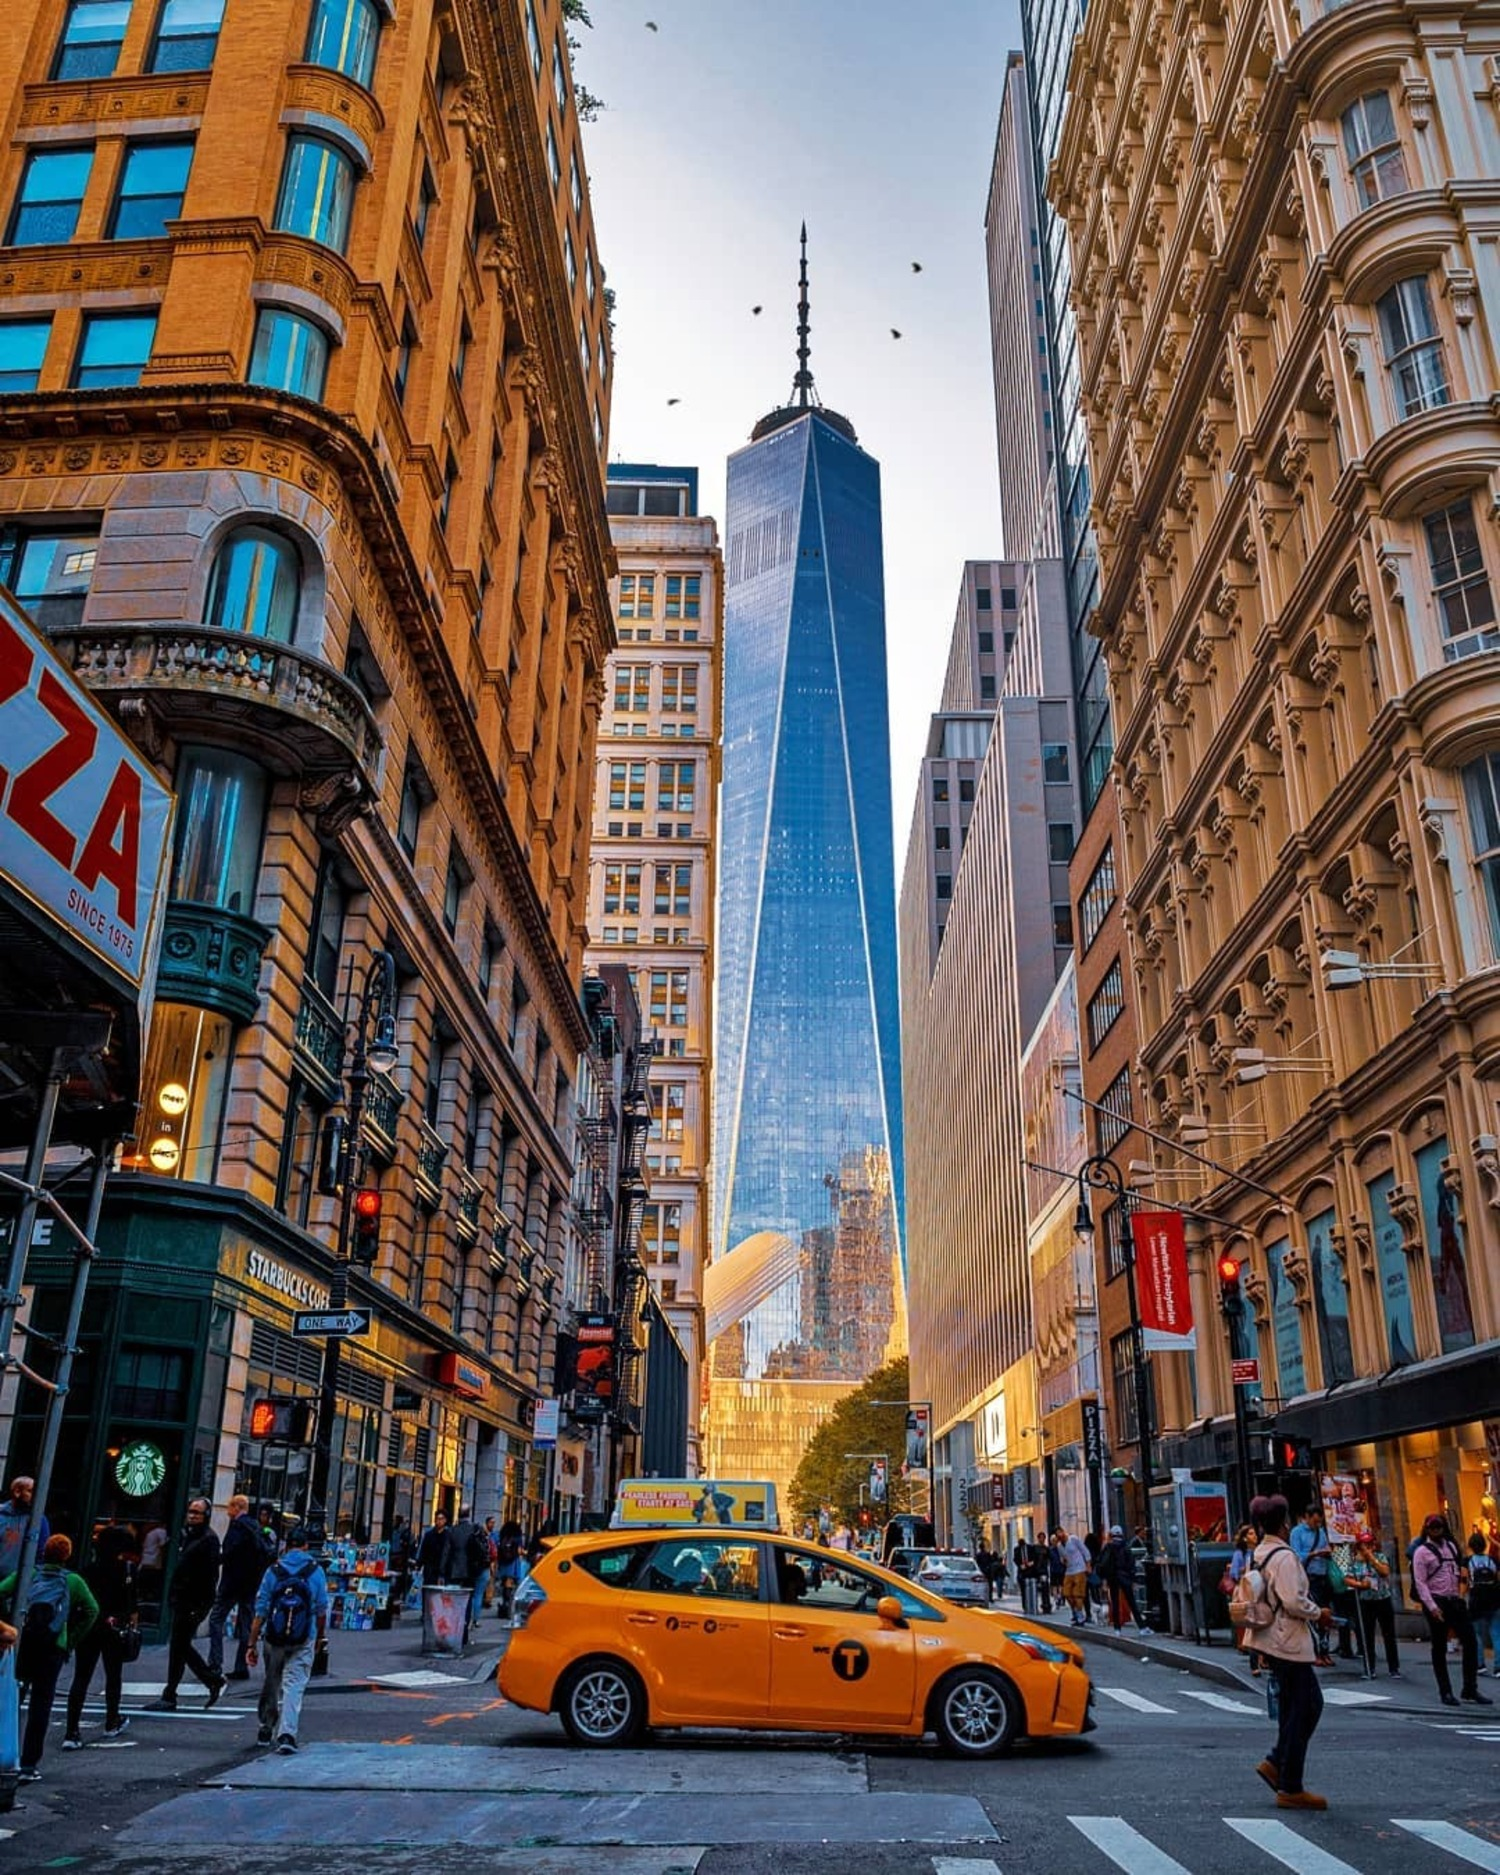 Fulton St and Nassau St, Financial District, Manhattan